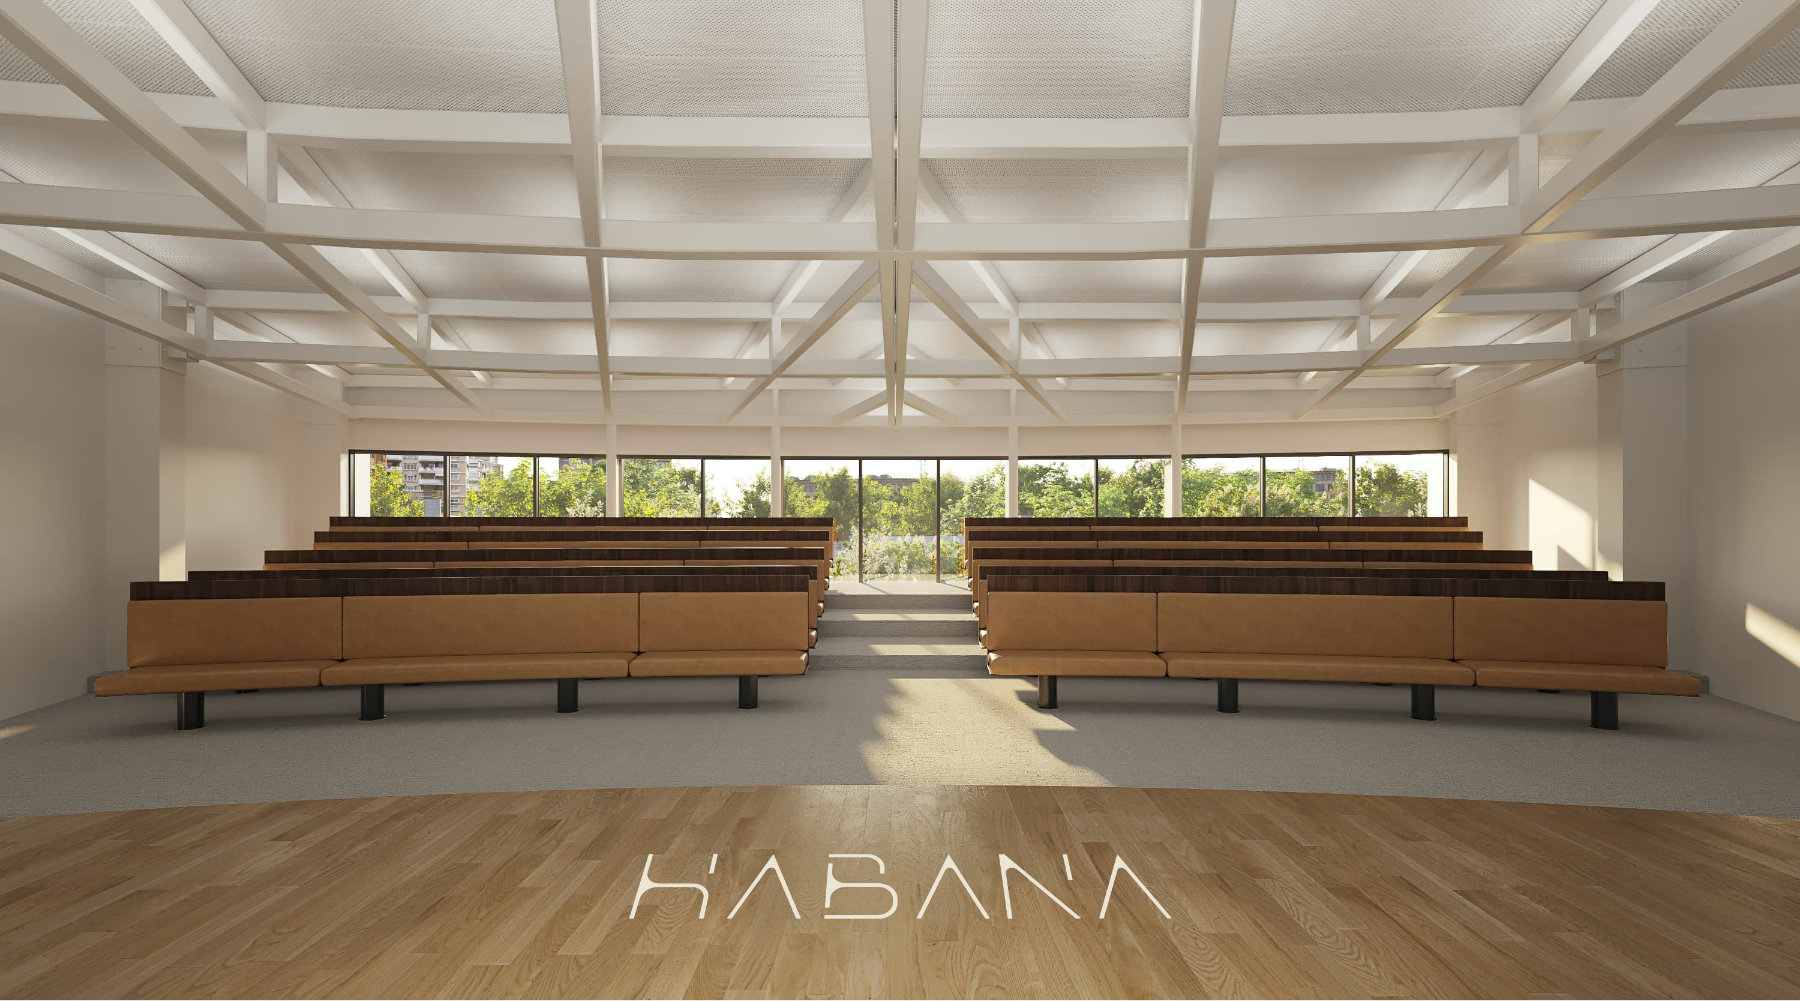 Auditorio edificio habana